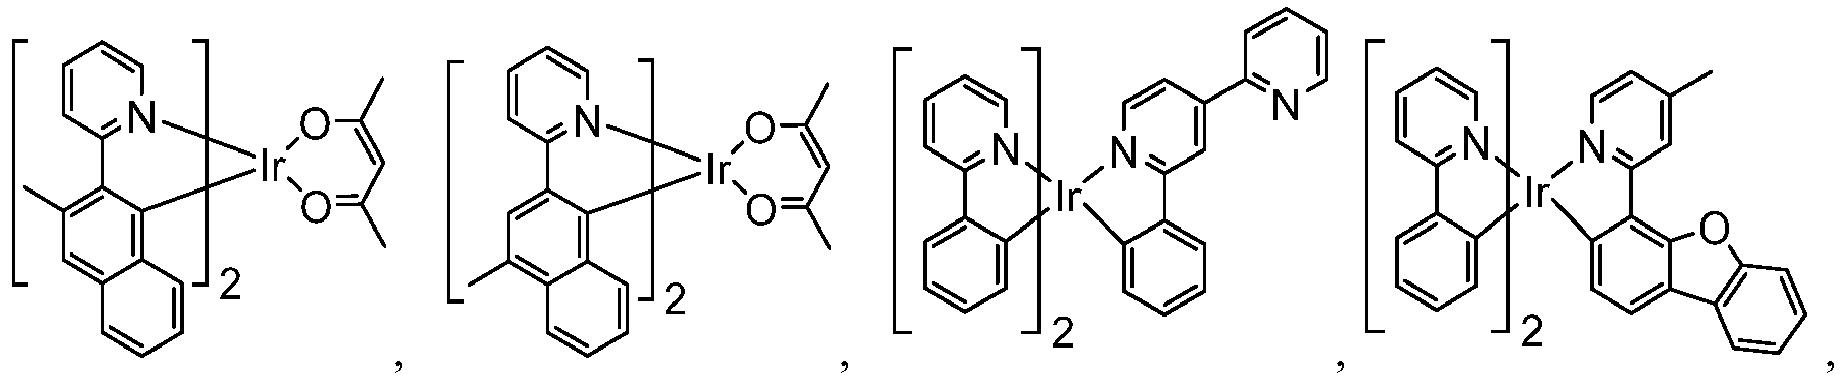 Figure imgb0265